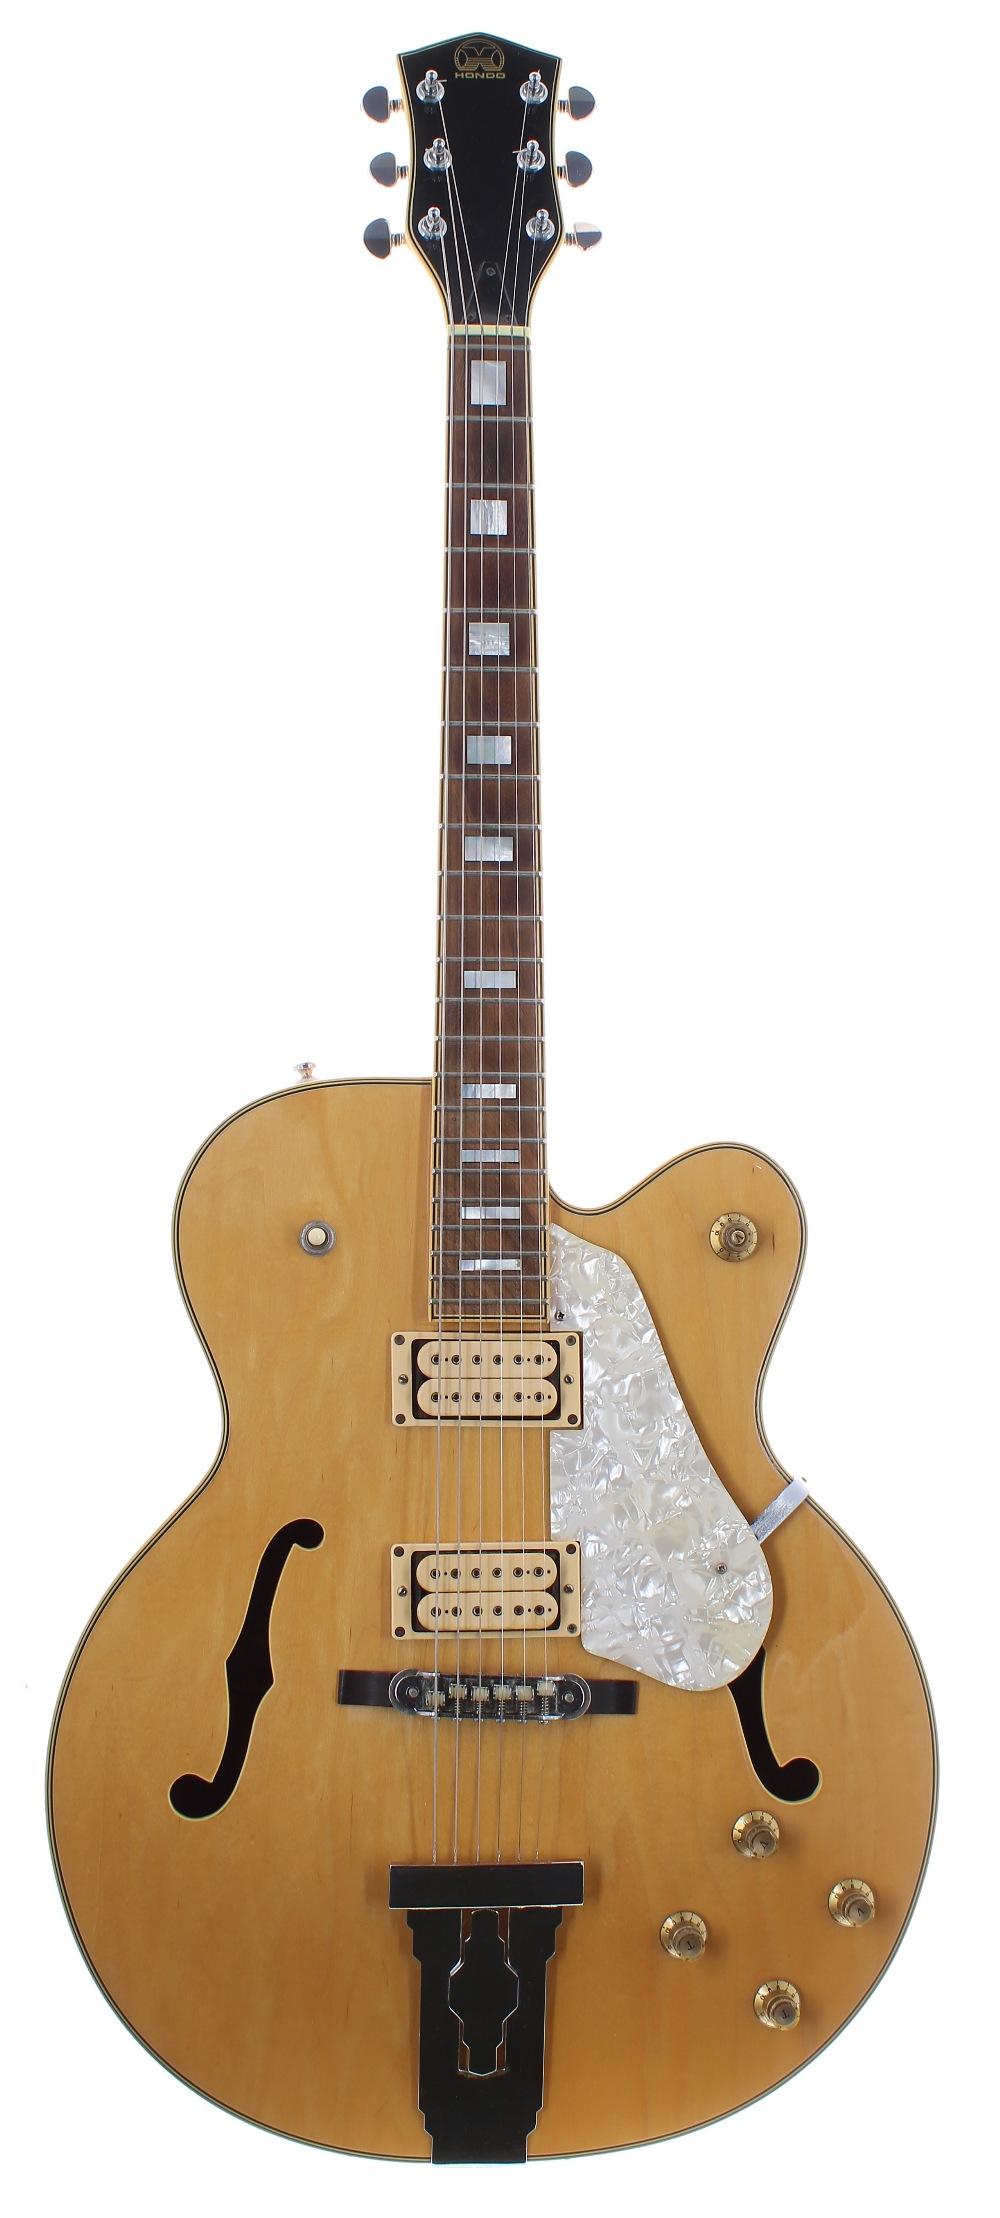 1980s Hondo HL5FBB Fat Boy hollow body electric guitar, ser. no. 88xxxxx9; Finish: natural;